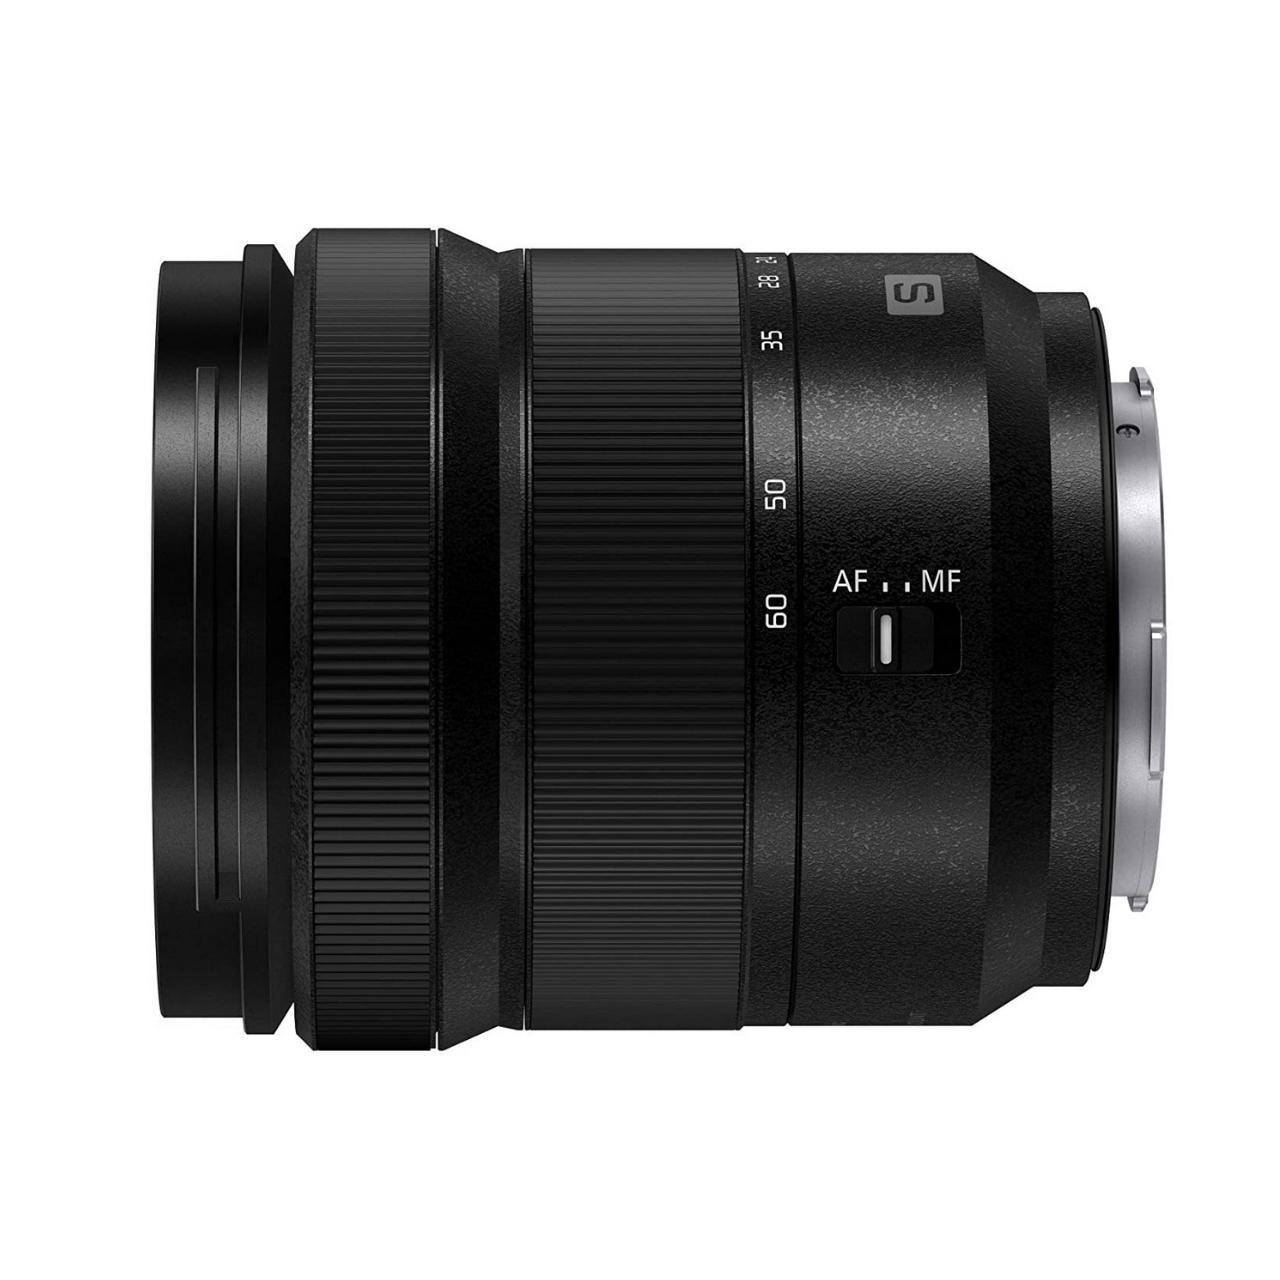 Panasonic Objetivo Lumix S 20-60mm f/3.5-5.6